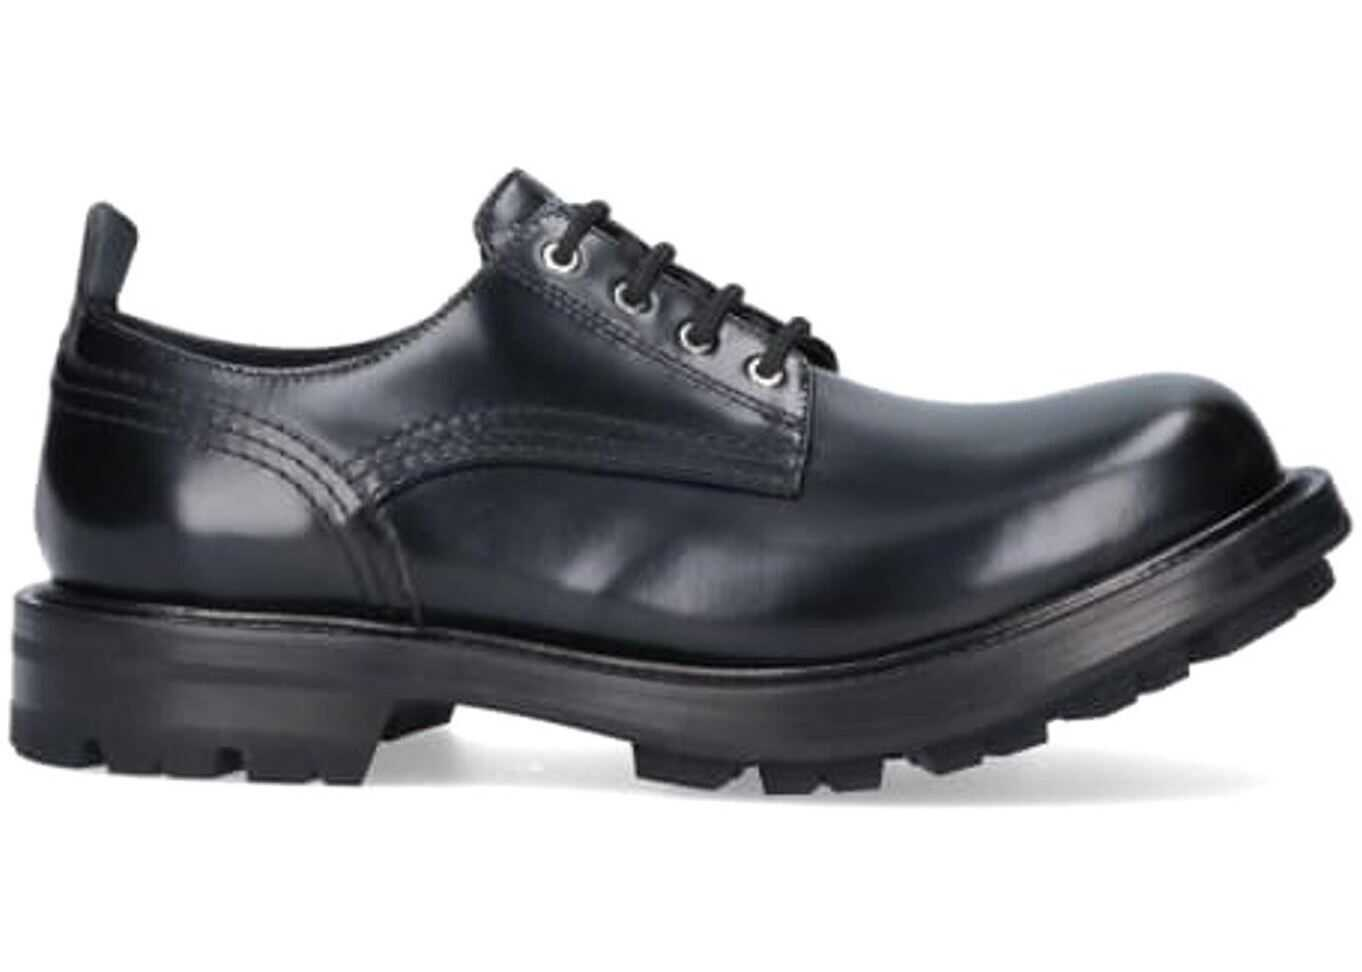 Alexander McQueen Leather Lace-Ups In Black 652663WHZ801000 Black imagine b-mall.ro